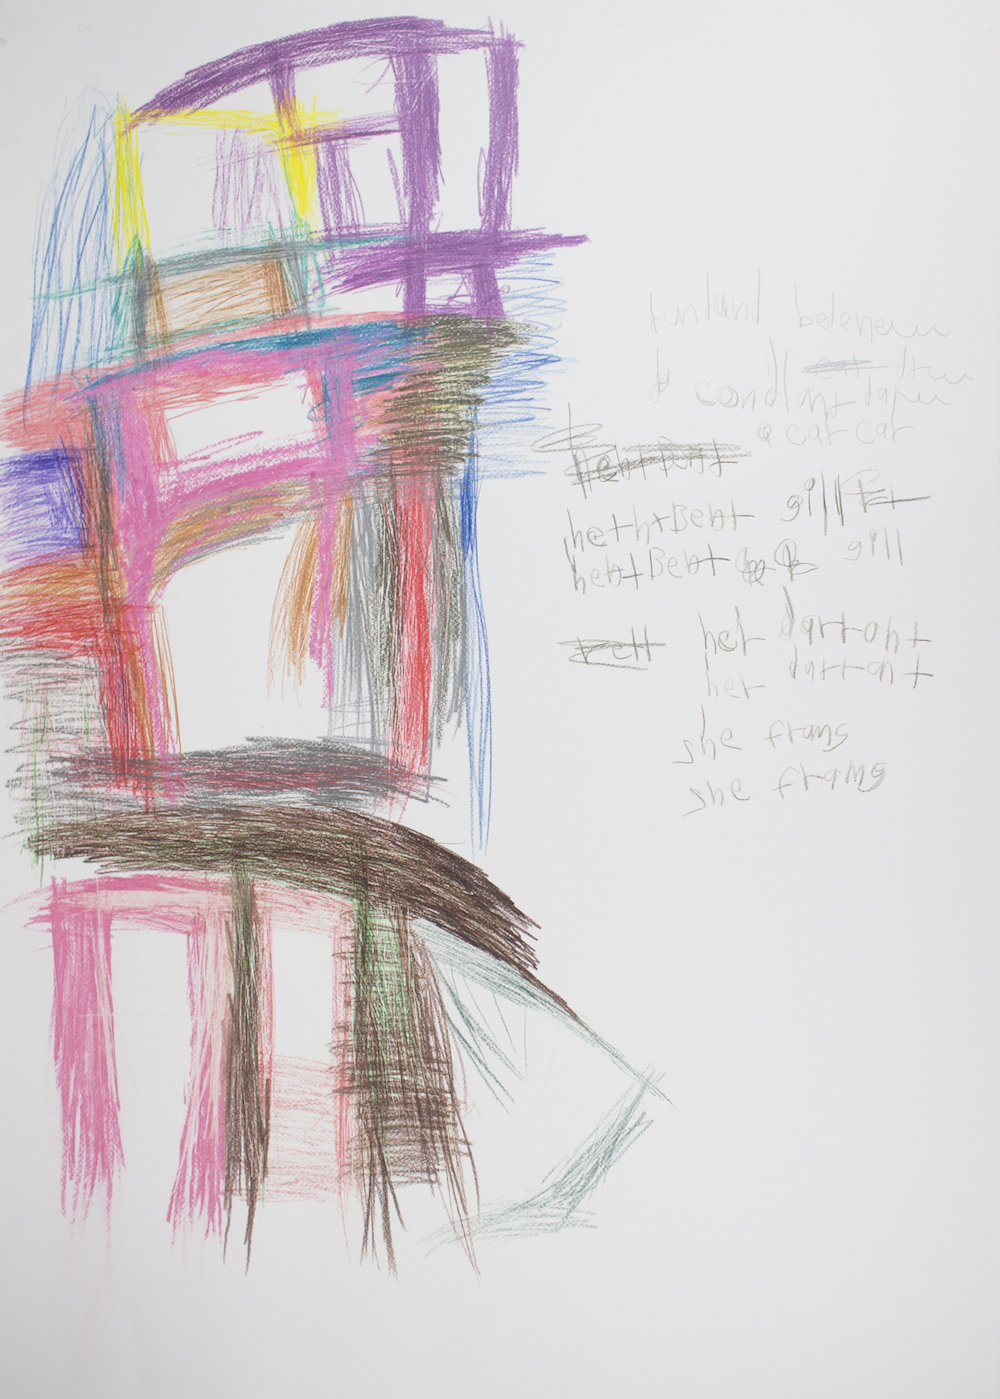 Heartbeat, 2018, pencil on paper, 70x100cm